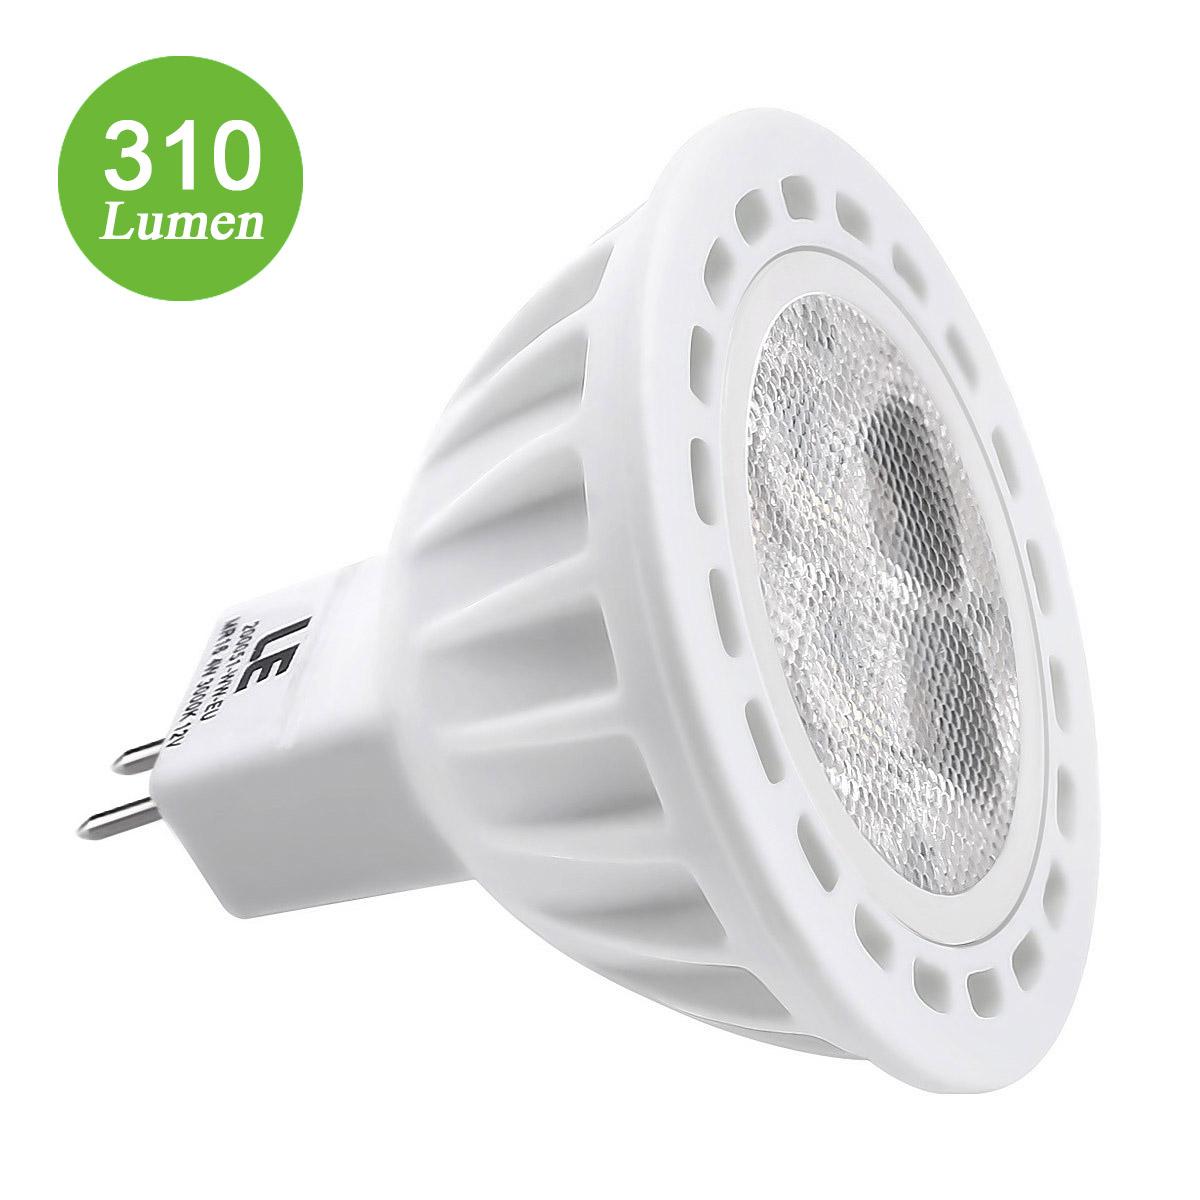 4W MR16 LED Spots, 310lm Gu5.3 LED Birnen, ersetzt 35W Halogenlampe, Warmweiß